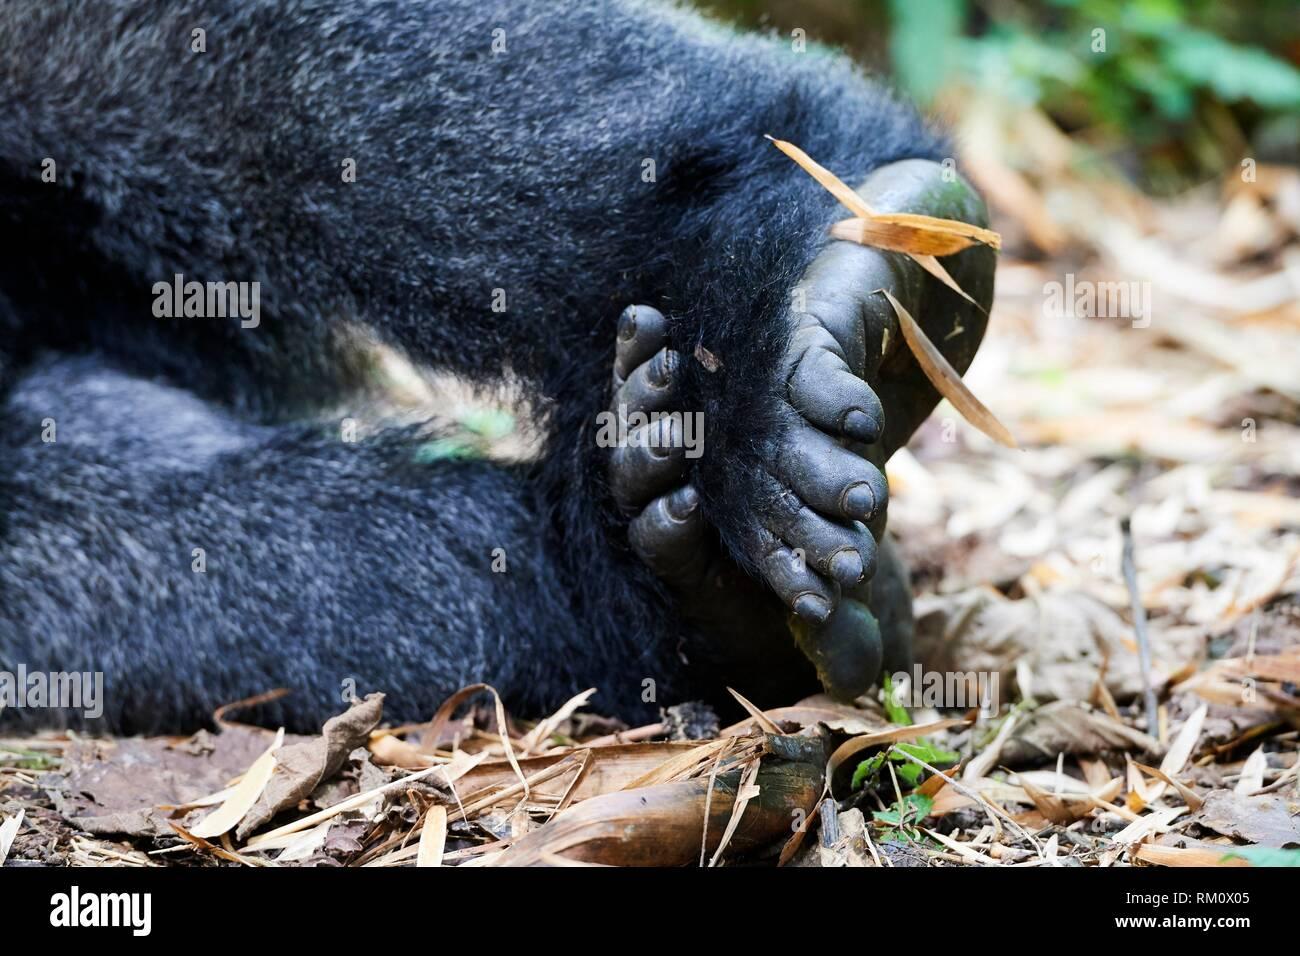 Close up on foot of Moutain gorilla (Gorilla beringei beringei) Virunga National Park, North Kivu, Democratic Republic of Congo, Africa. - Stock Image